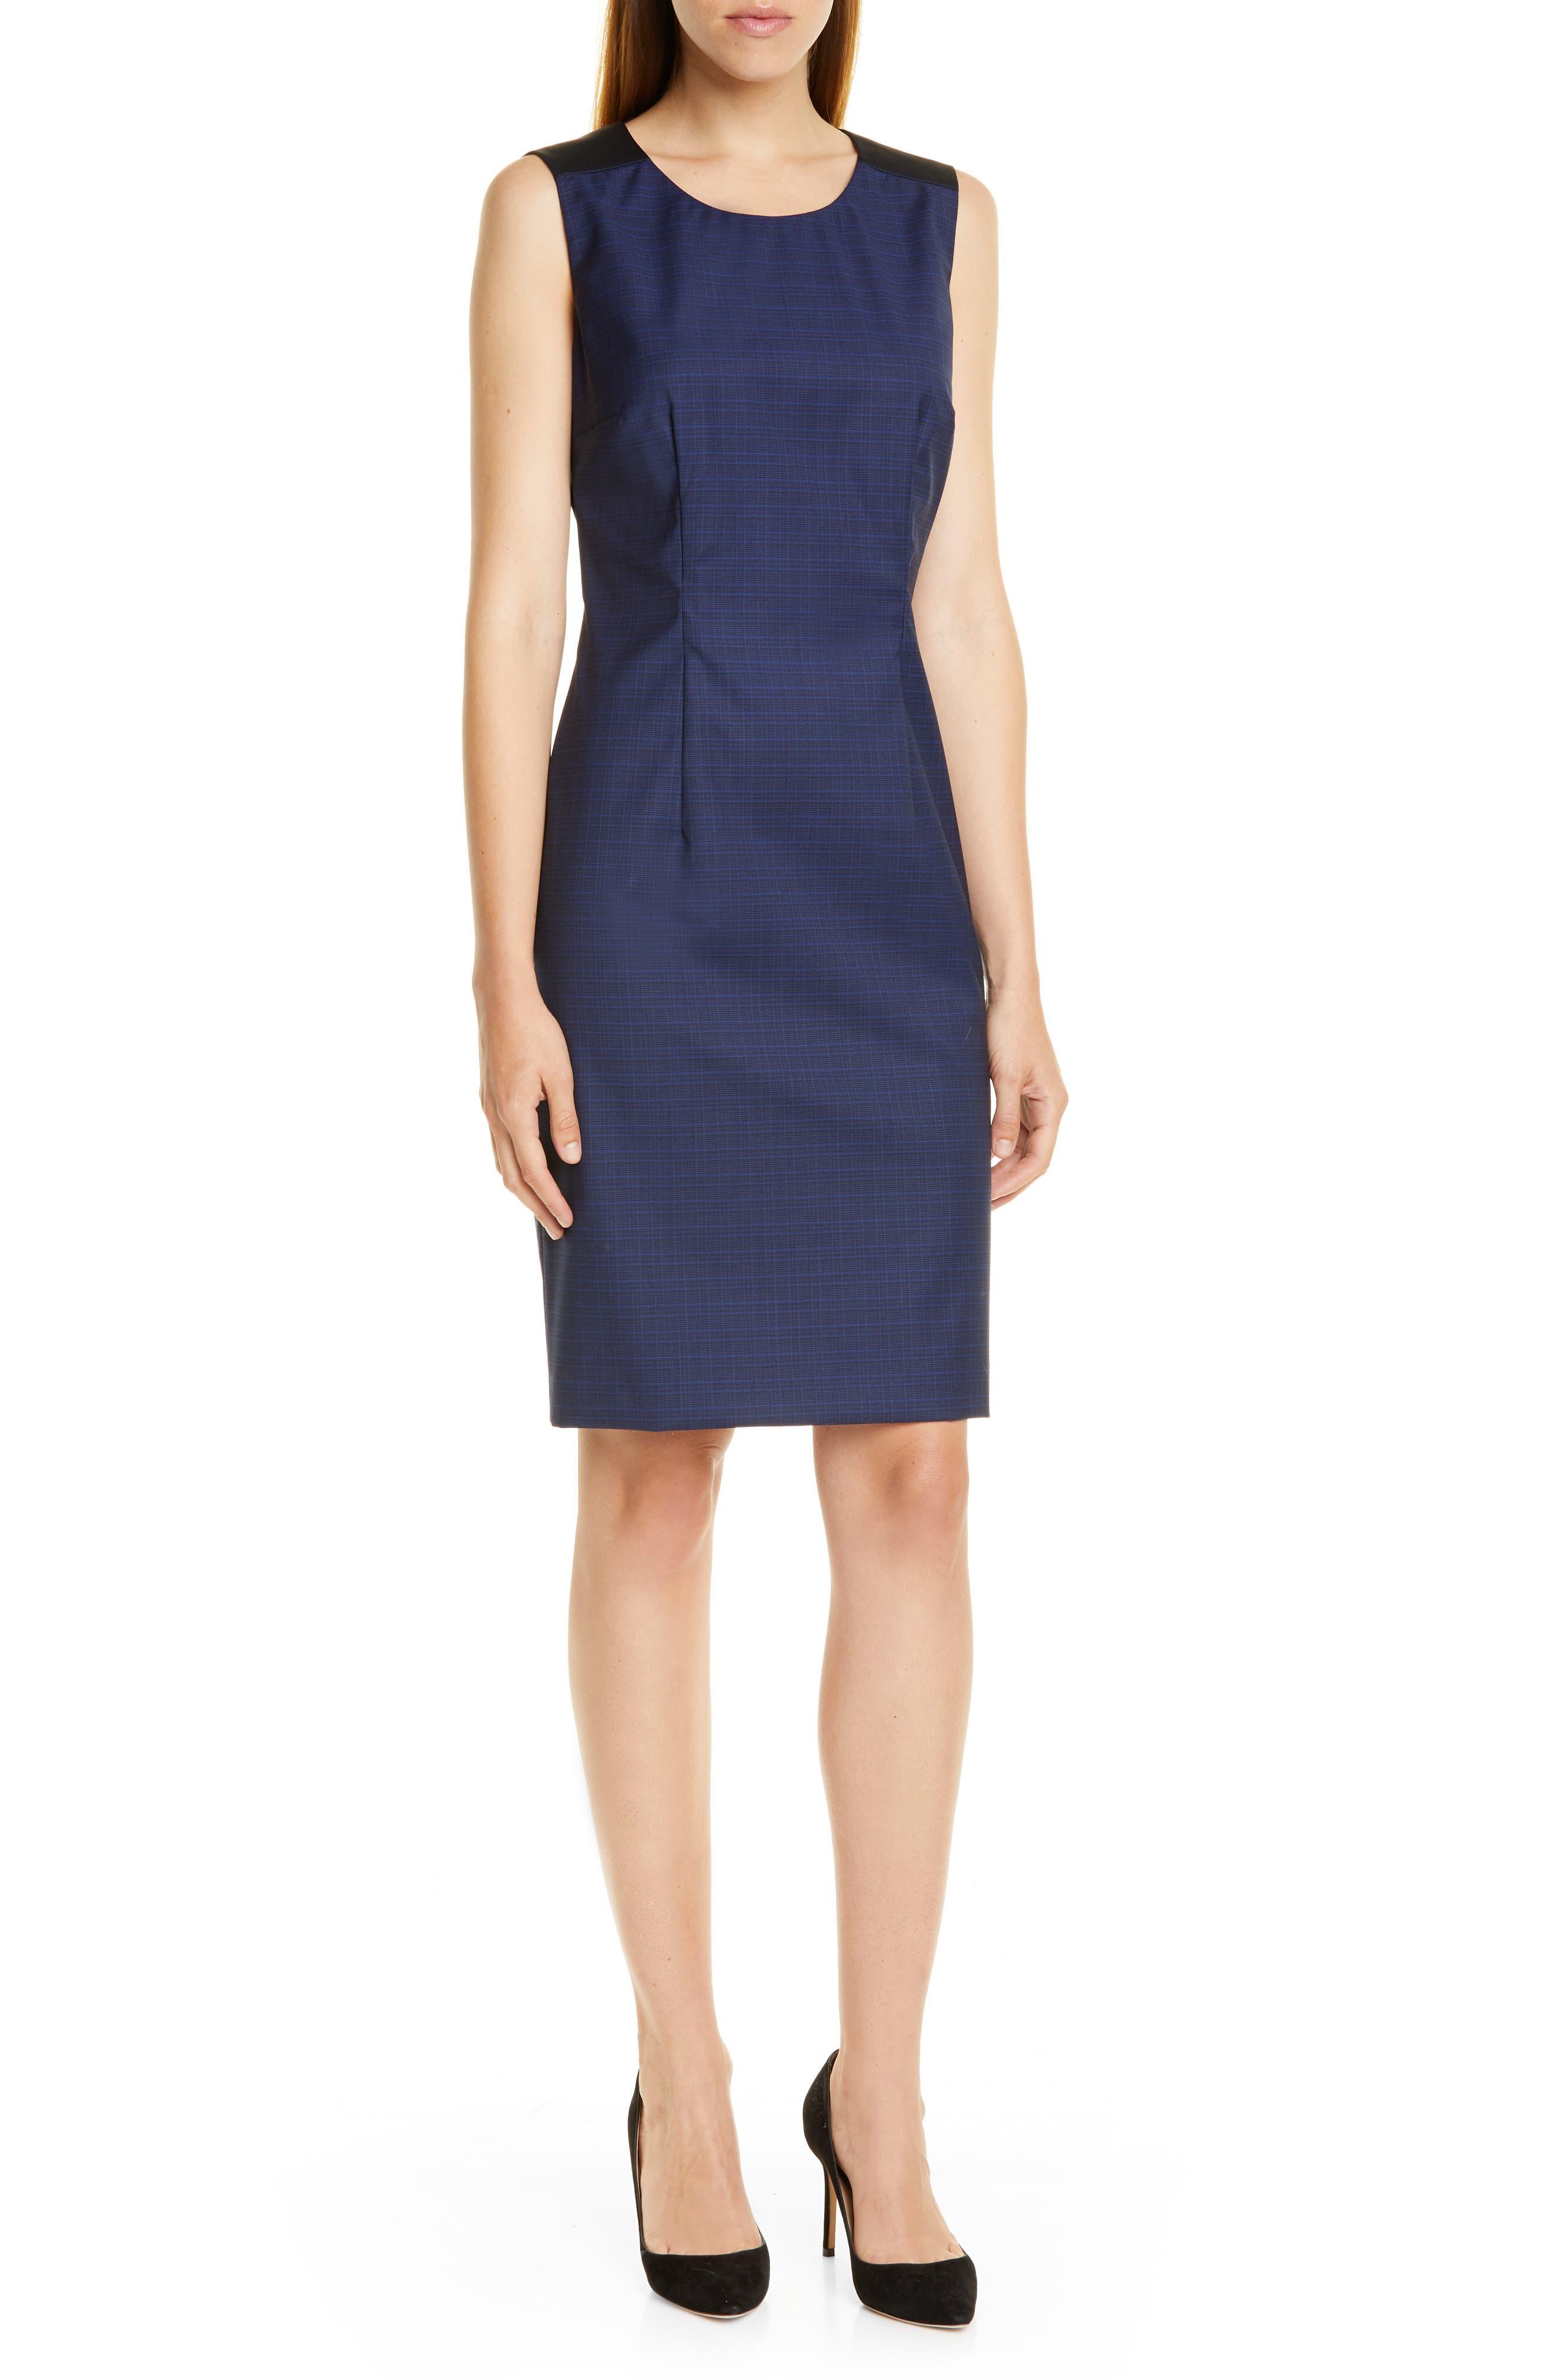 Petite Boss Dristie Wool Sheath Dress, P - Blue (Regular & Petite) (Nordstrom Exclusive)